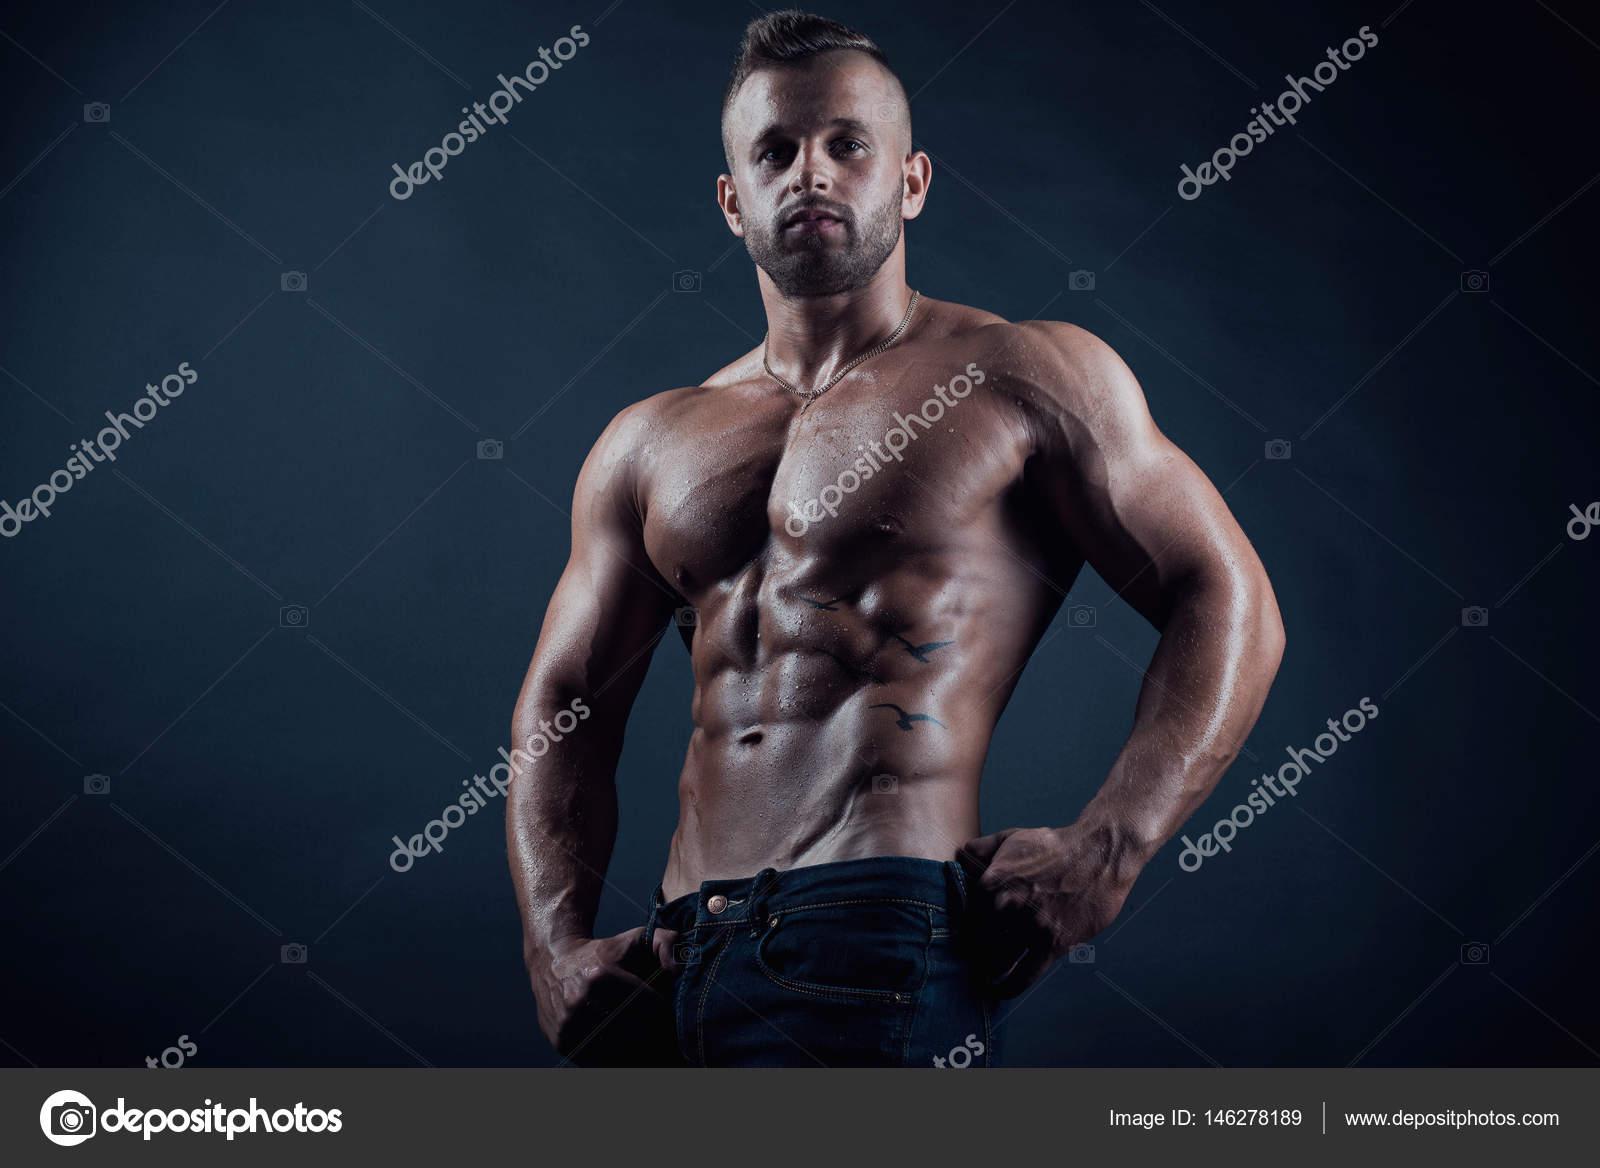 Poses De Modelos Hombres Profesionales Modelo Atractivo Deportivo